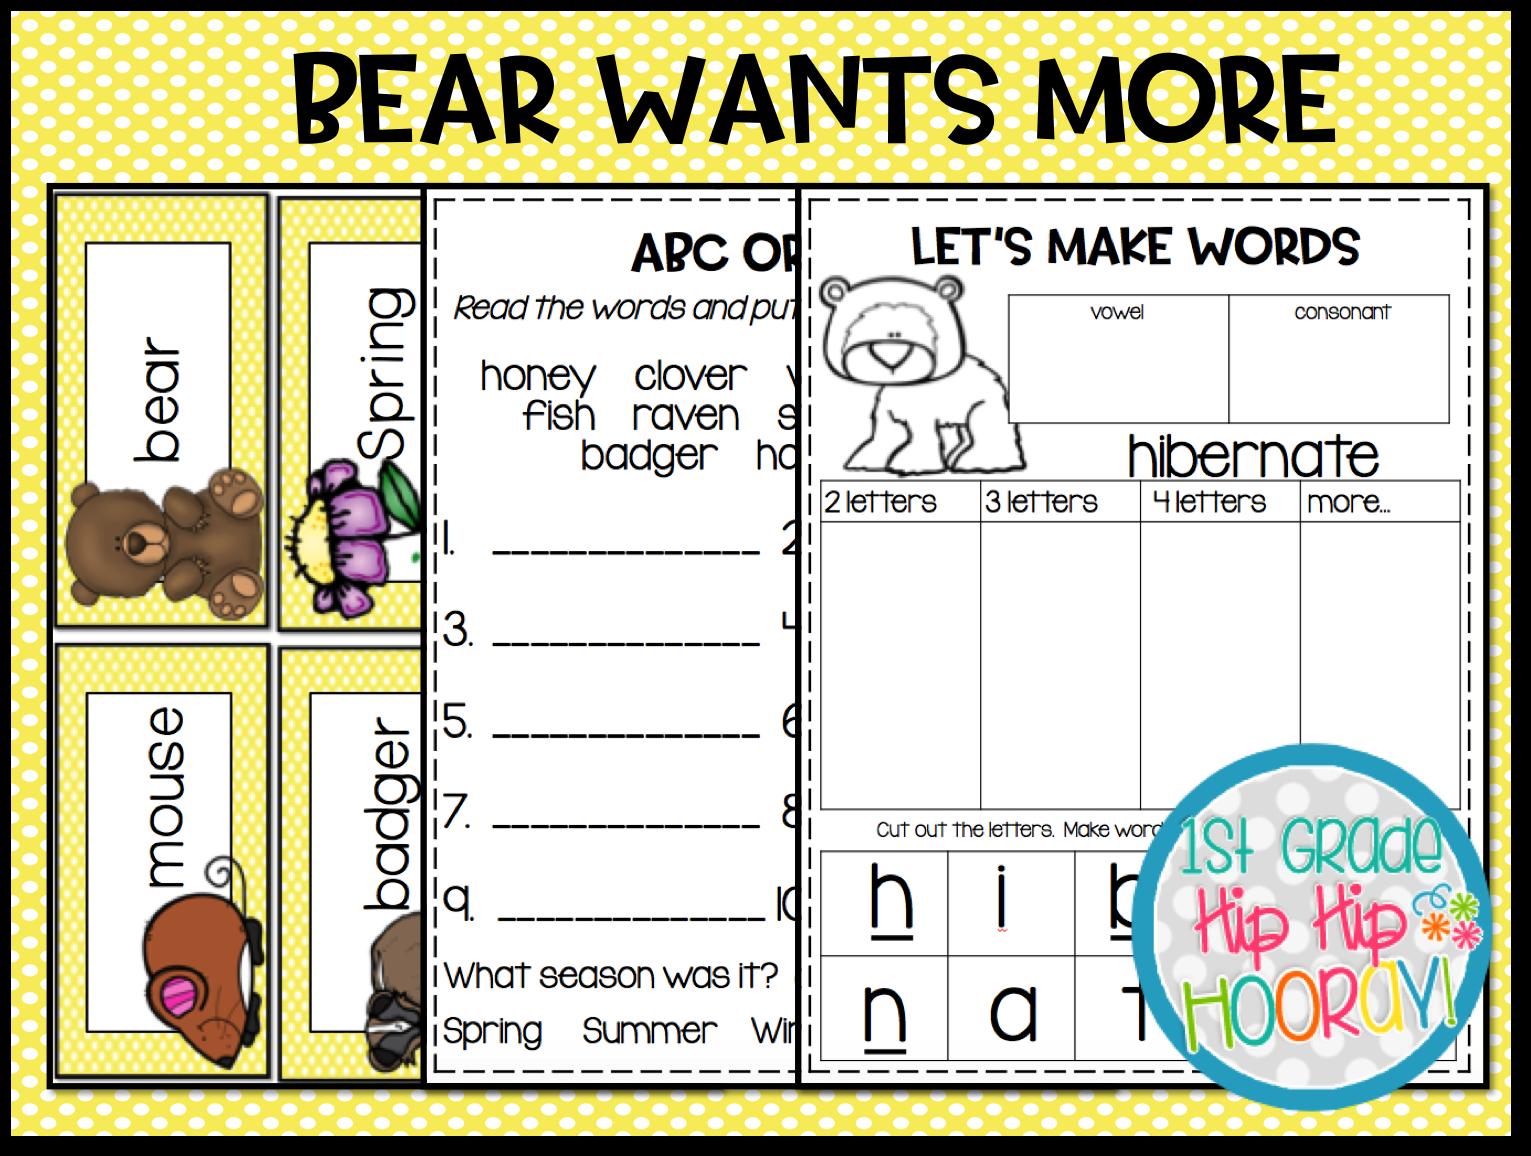 1st Grade Hip Hip Hooray Spring Literacy Suggestion